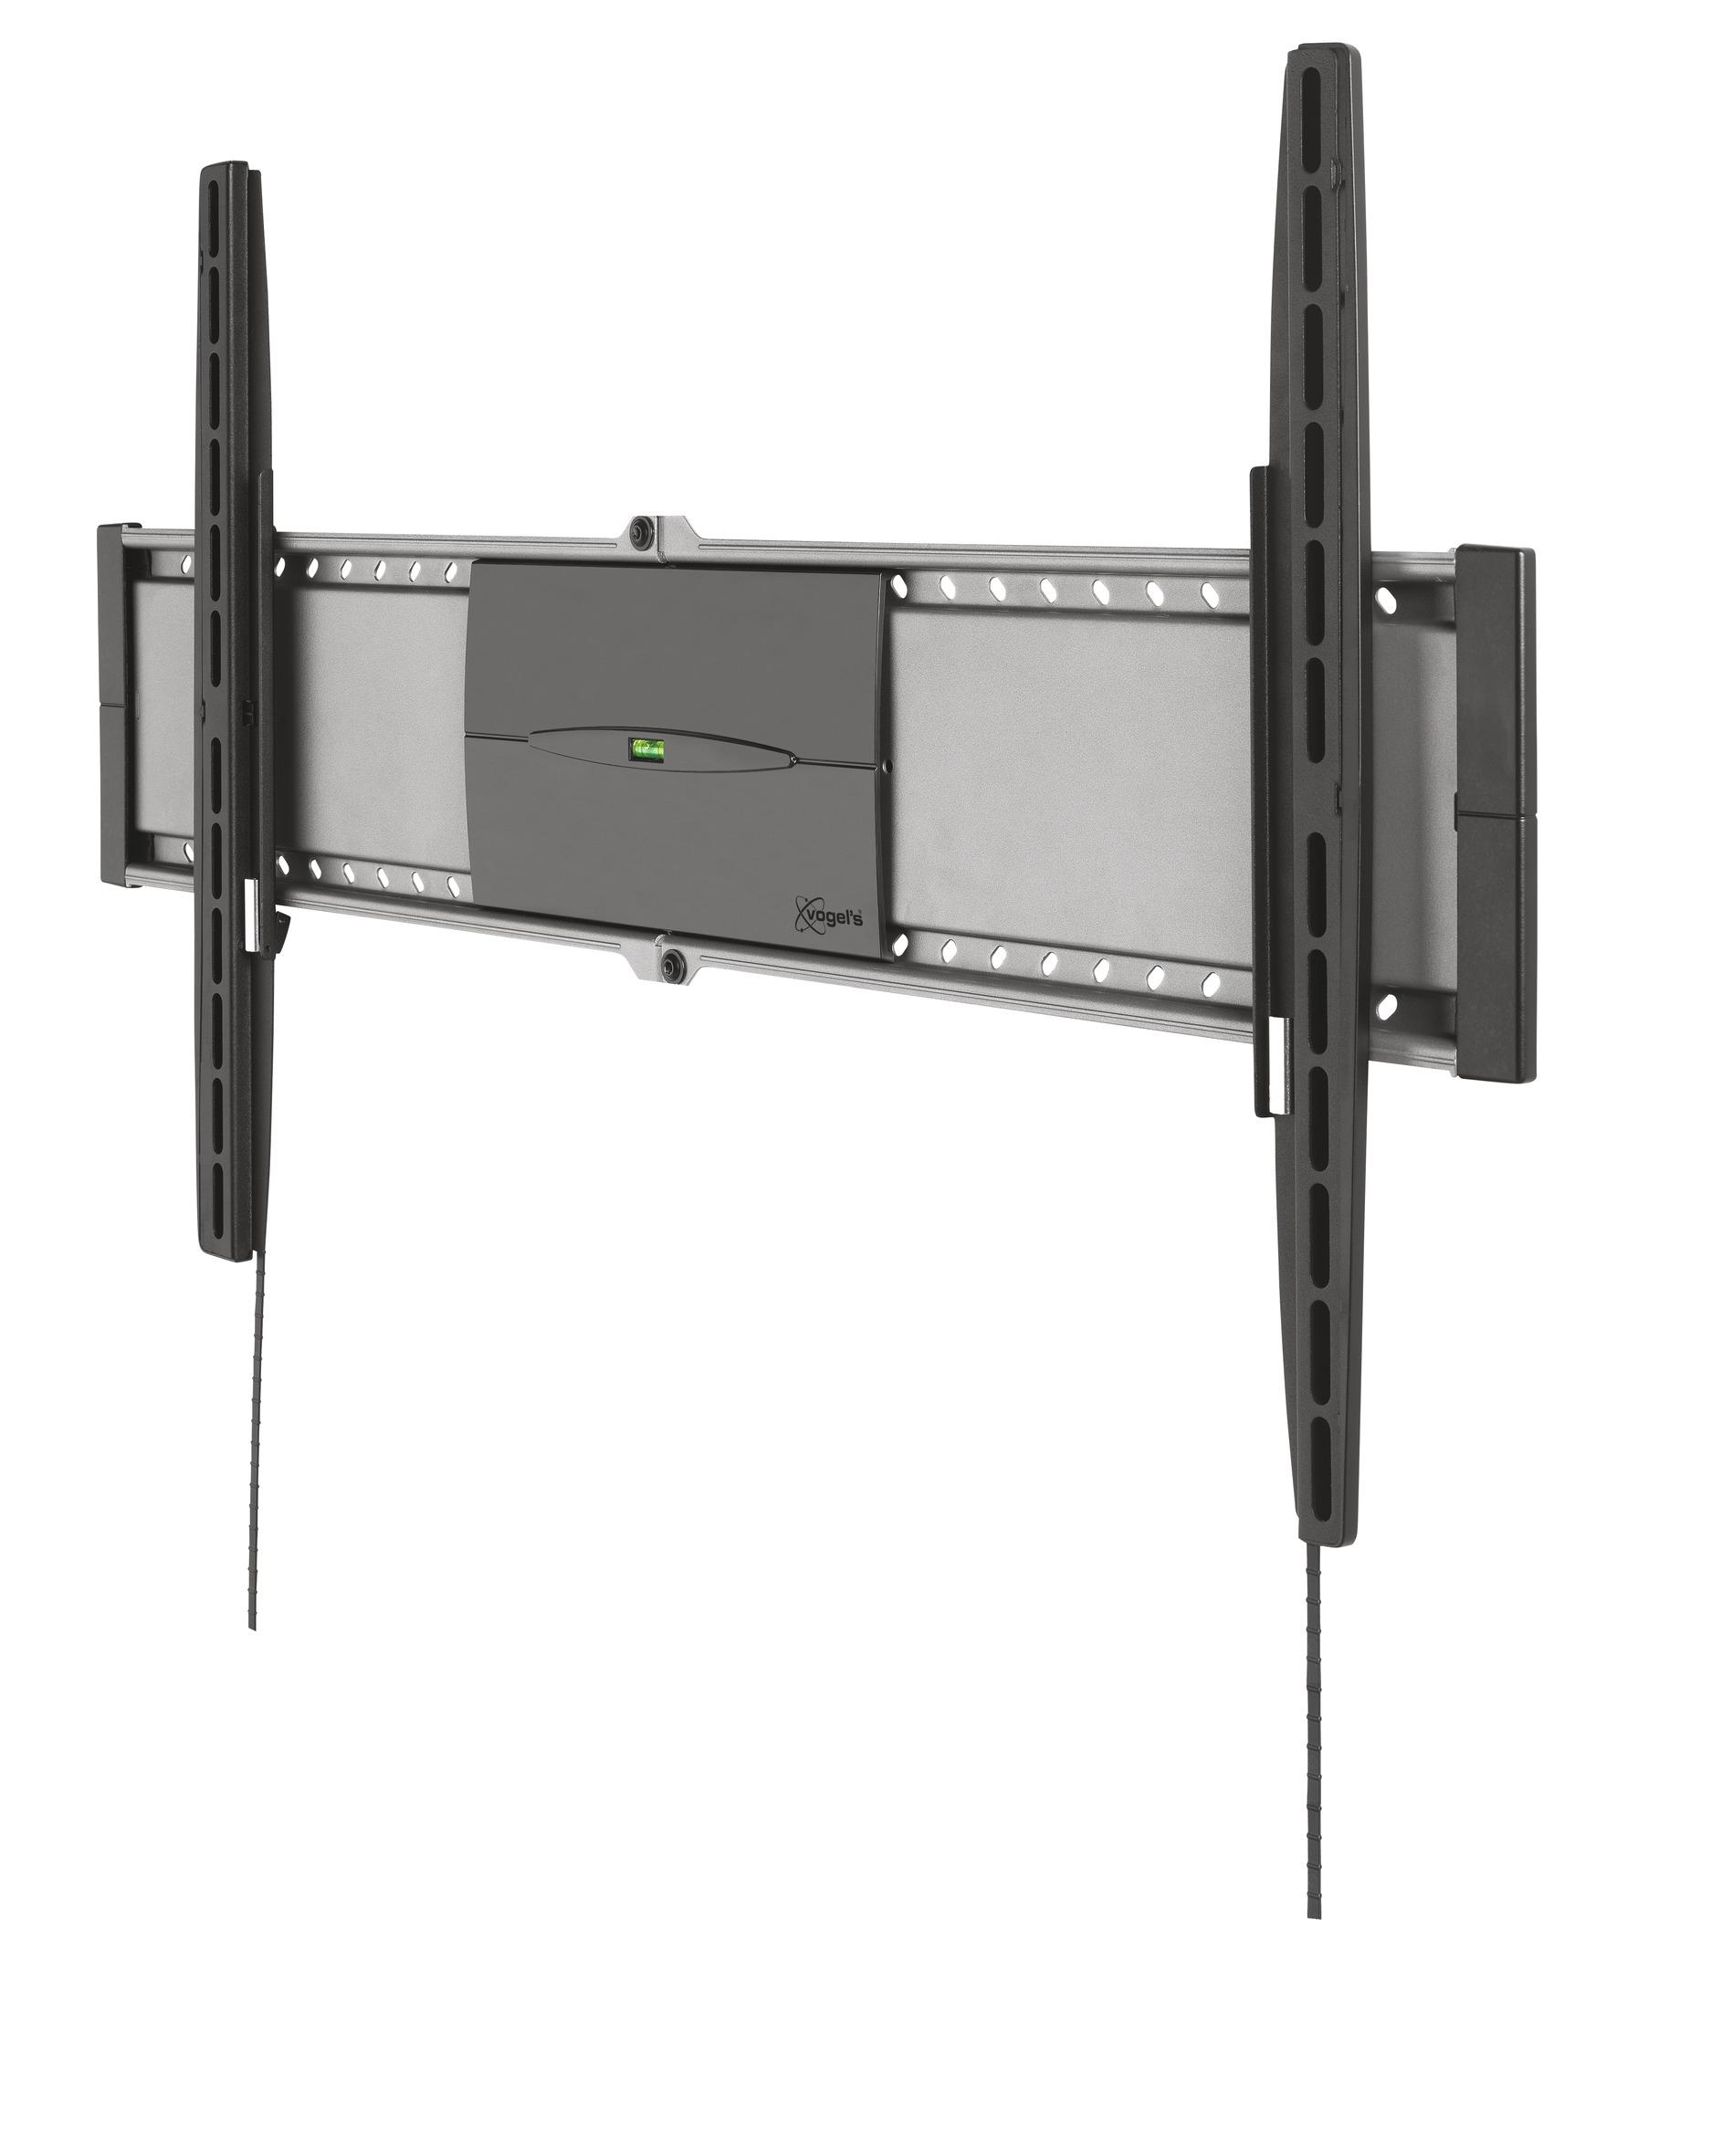 Vogel's EFW 8305 LCD/Plasma wall mount Superflat L